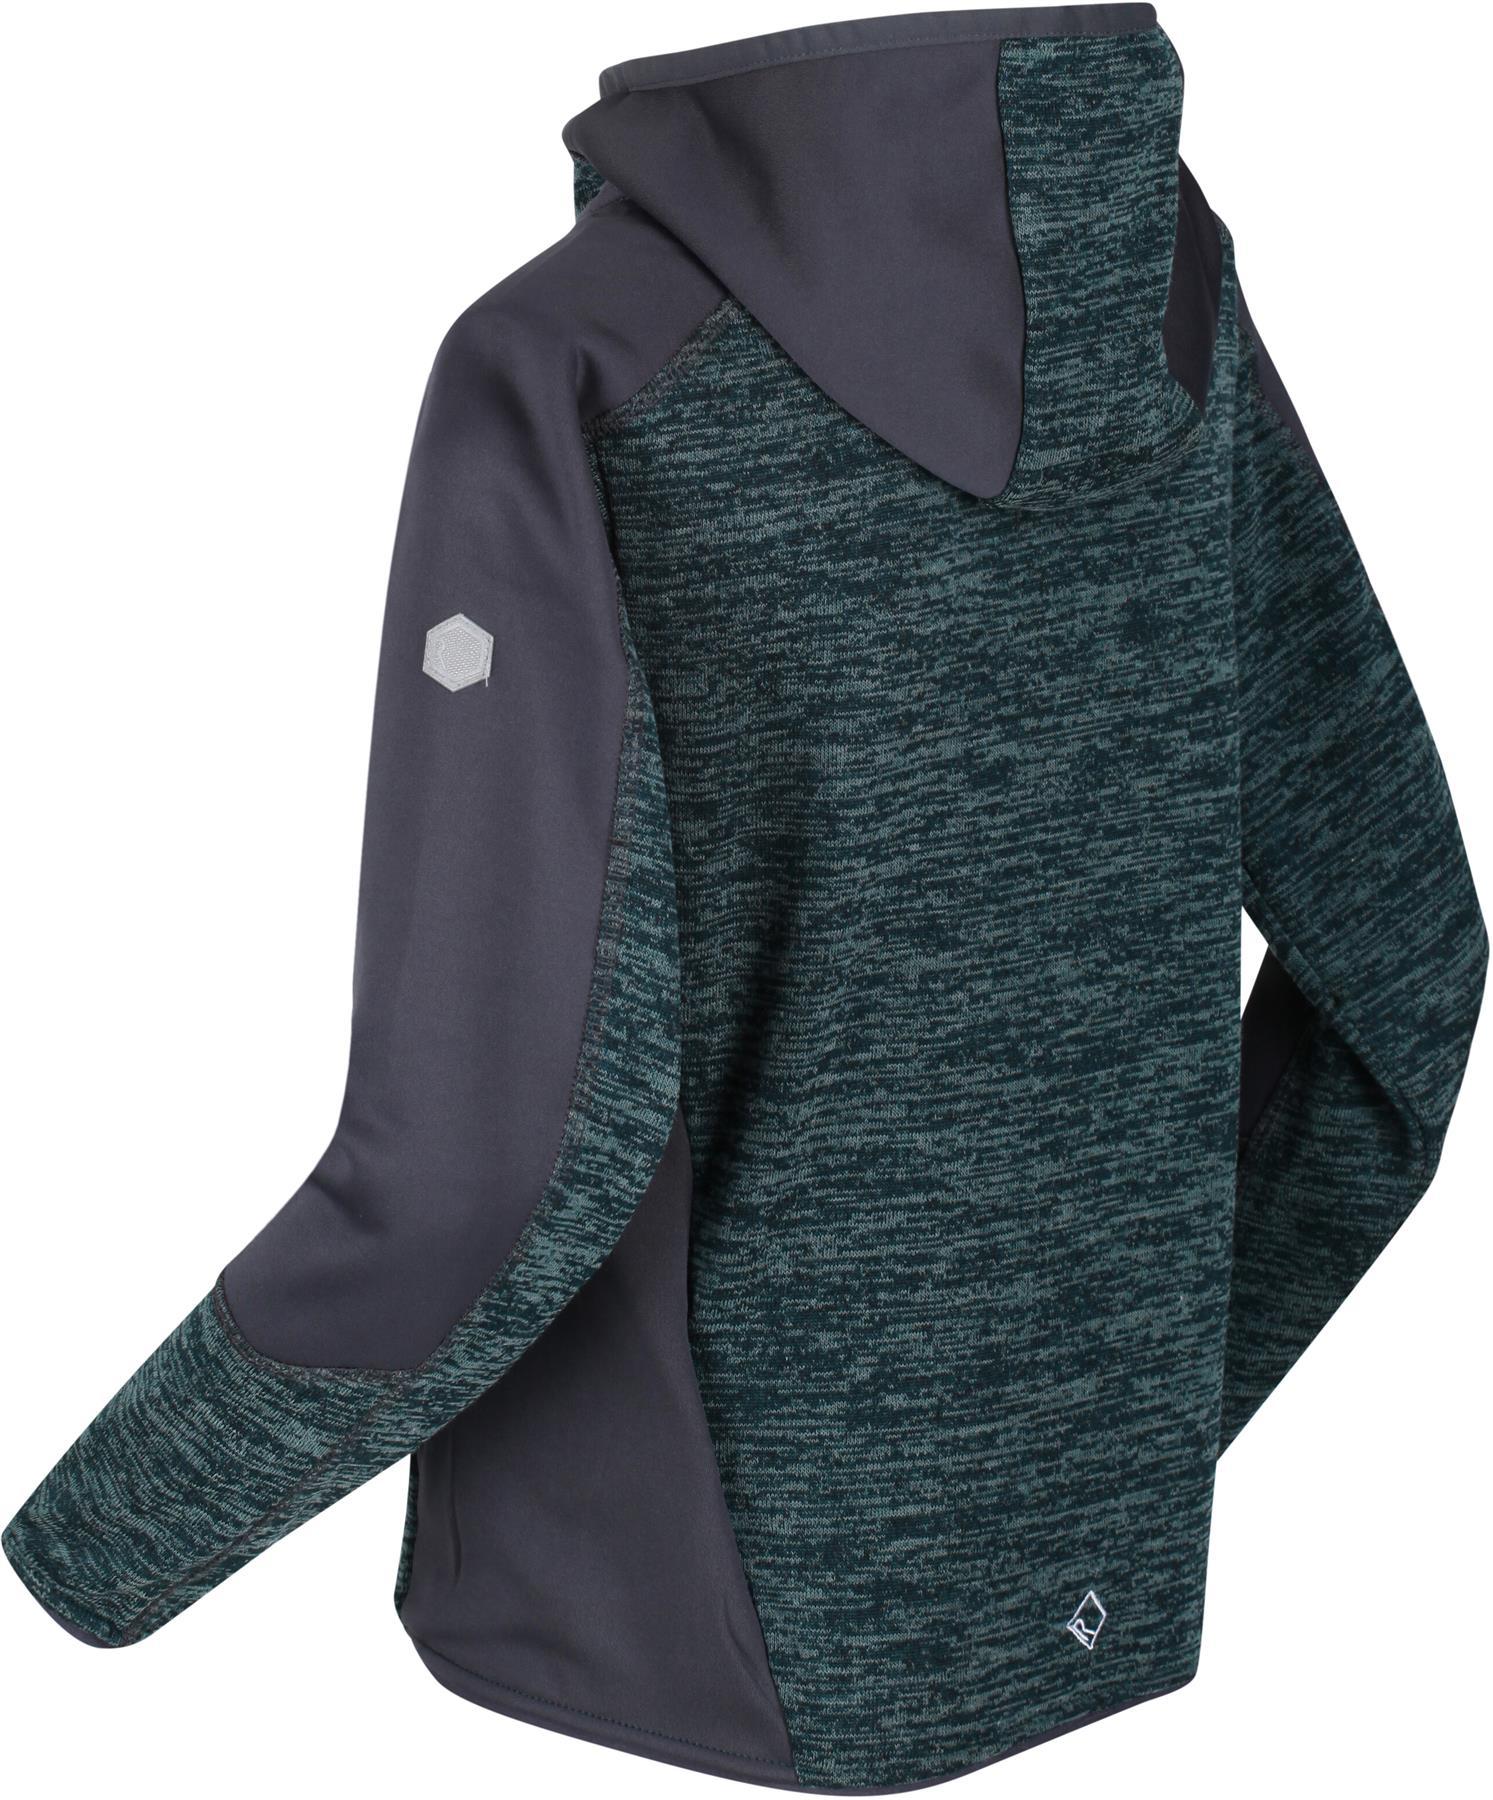 miniatuur 4 - Regatta Kids Dissolver III Full Zip Insulated Fleece Jacket Hoodie Boys Girls